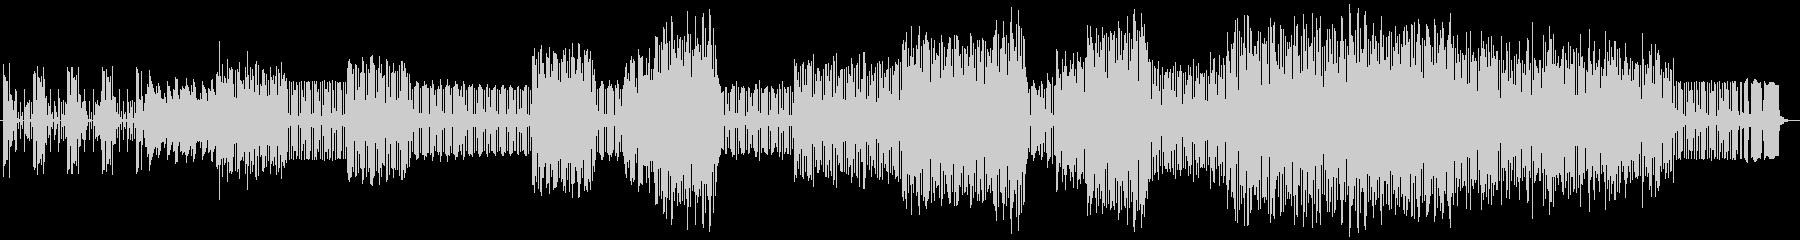 Jupitar-8の低音で延々七拍子の未再生の波形